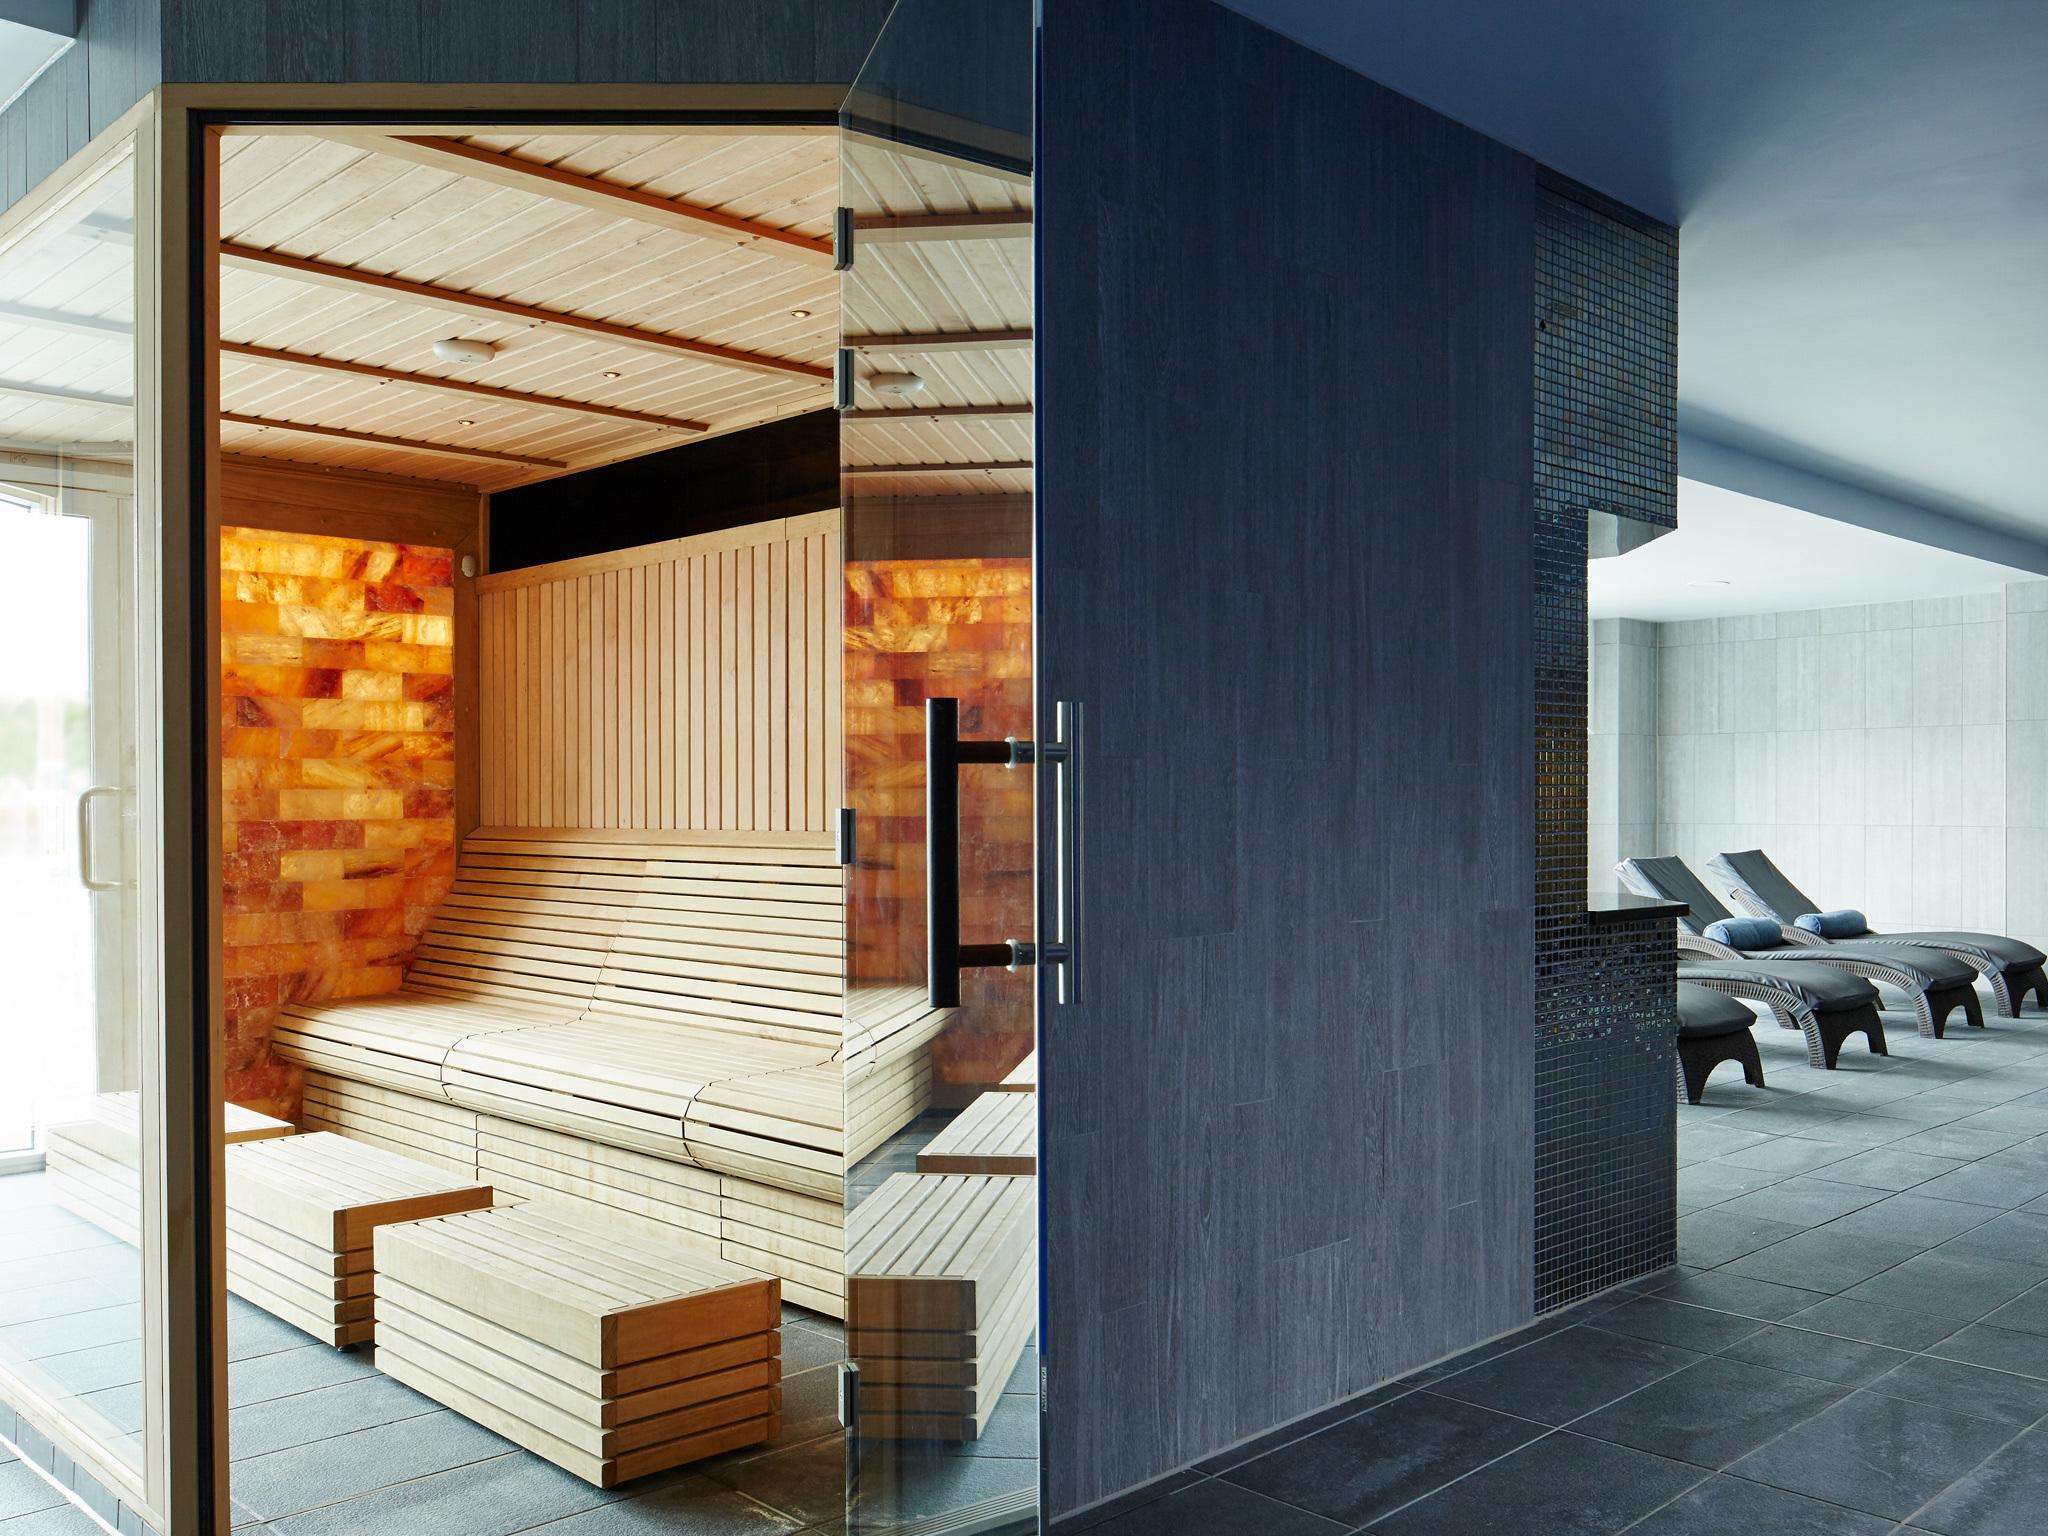 Formby Hall spa near Liverpool